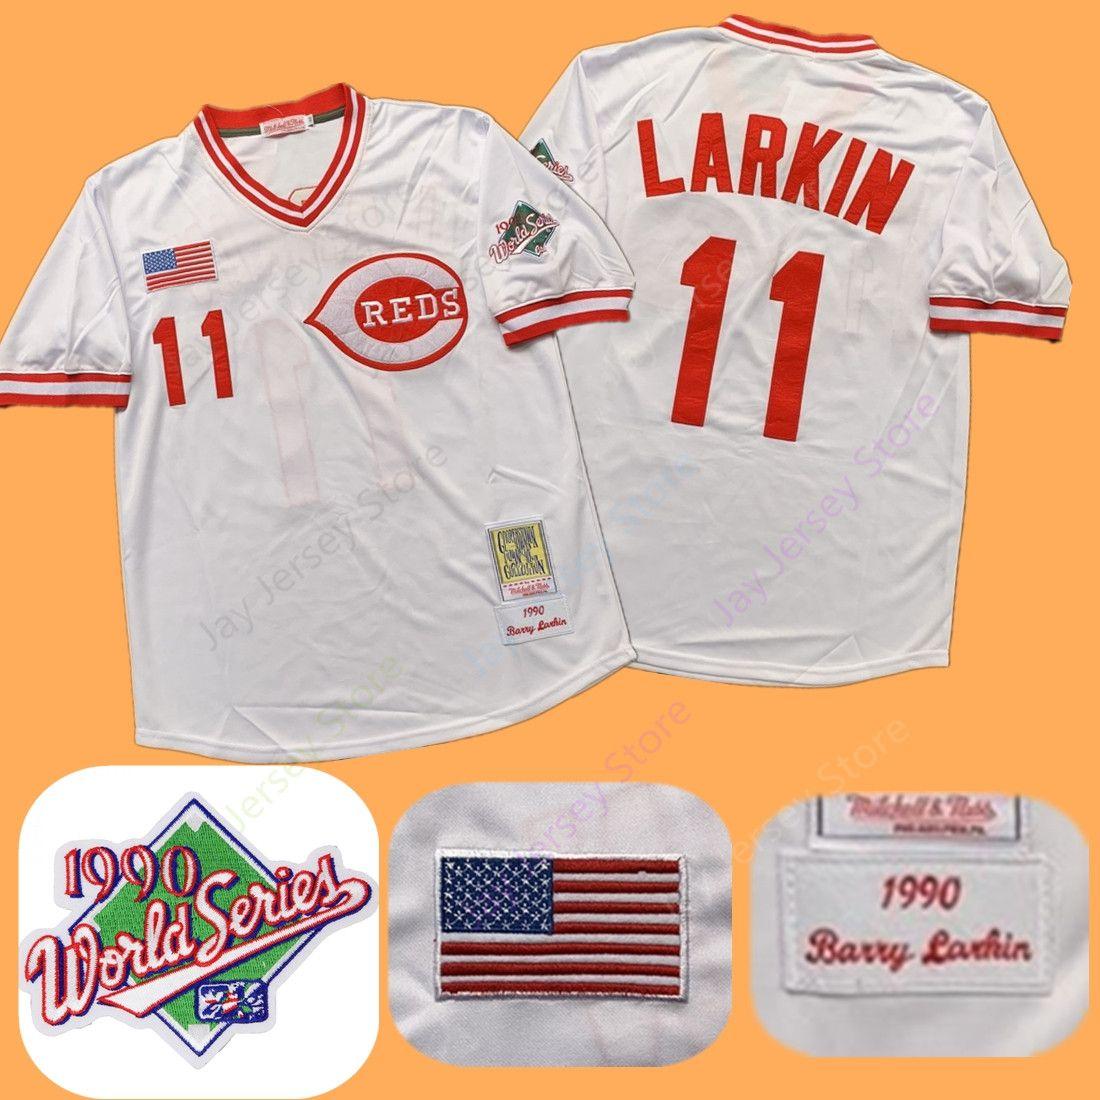 size 40 24cd7 c29f0 Barry Larkin Jersey 1990 Reds WS World Series Patch Cooperstown Cincinnati  Grey White Red Mesh BP Throwback Stitched Flexbase Men Size M-3XL